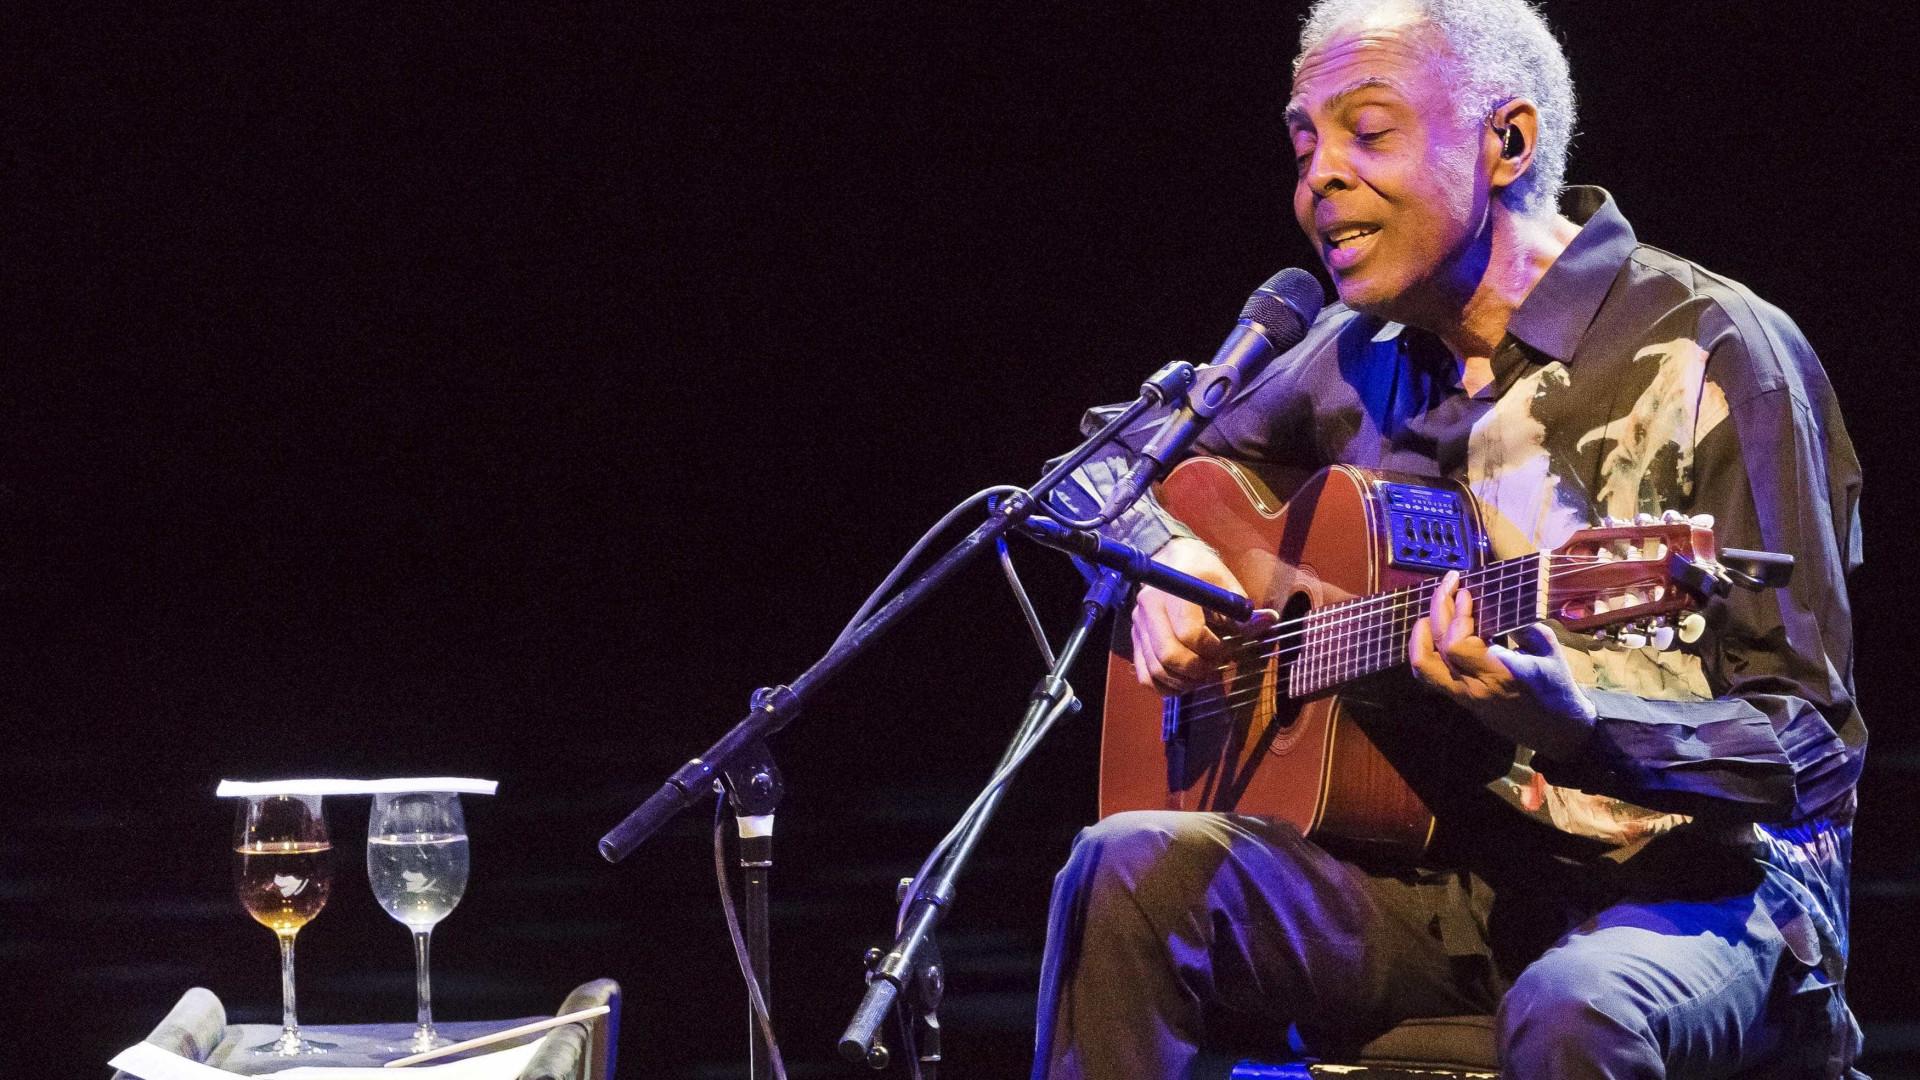 Gilberto Gil faz show especial do disco 'Refavela' no Festival Bananada